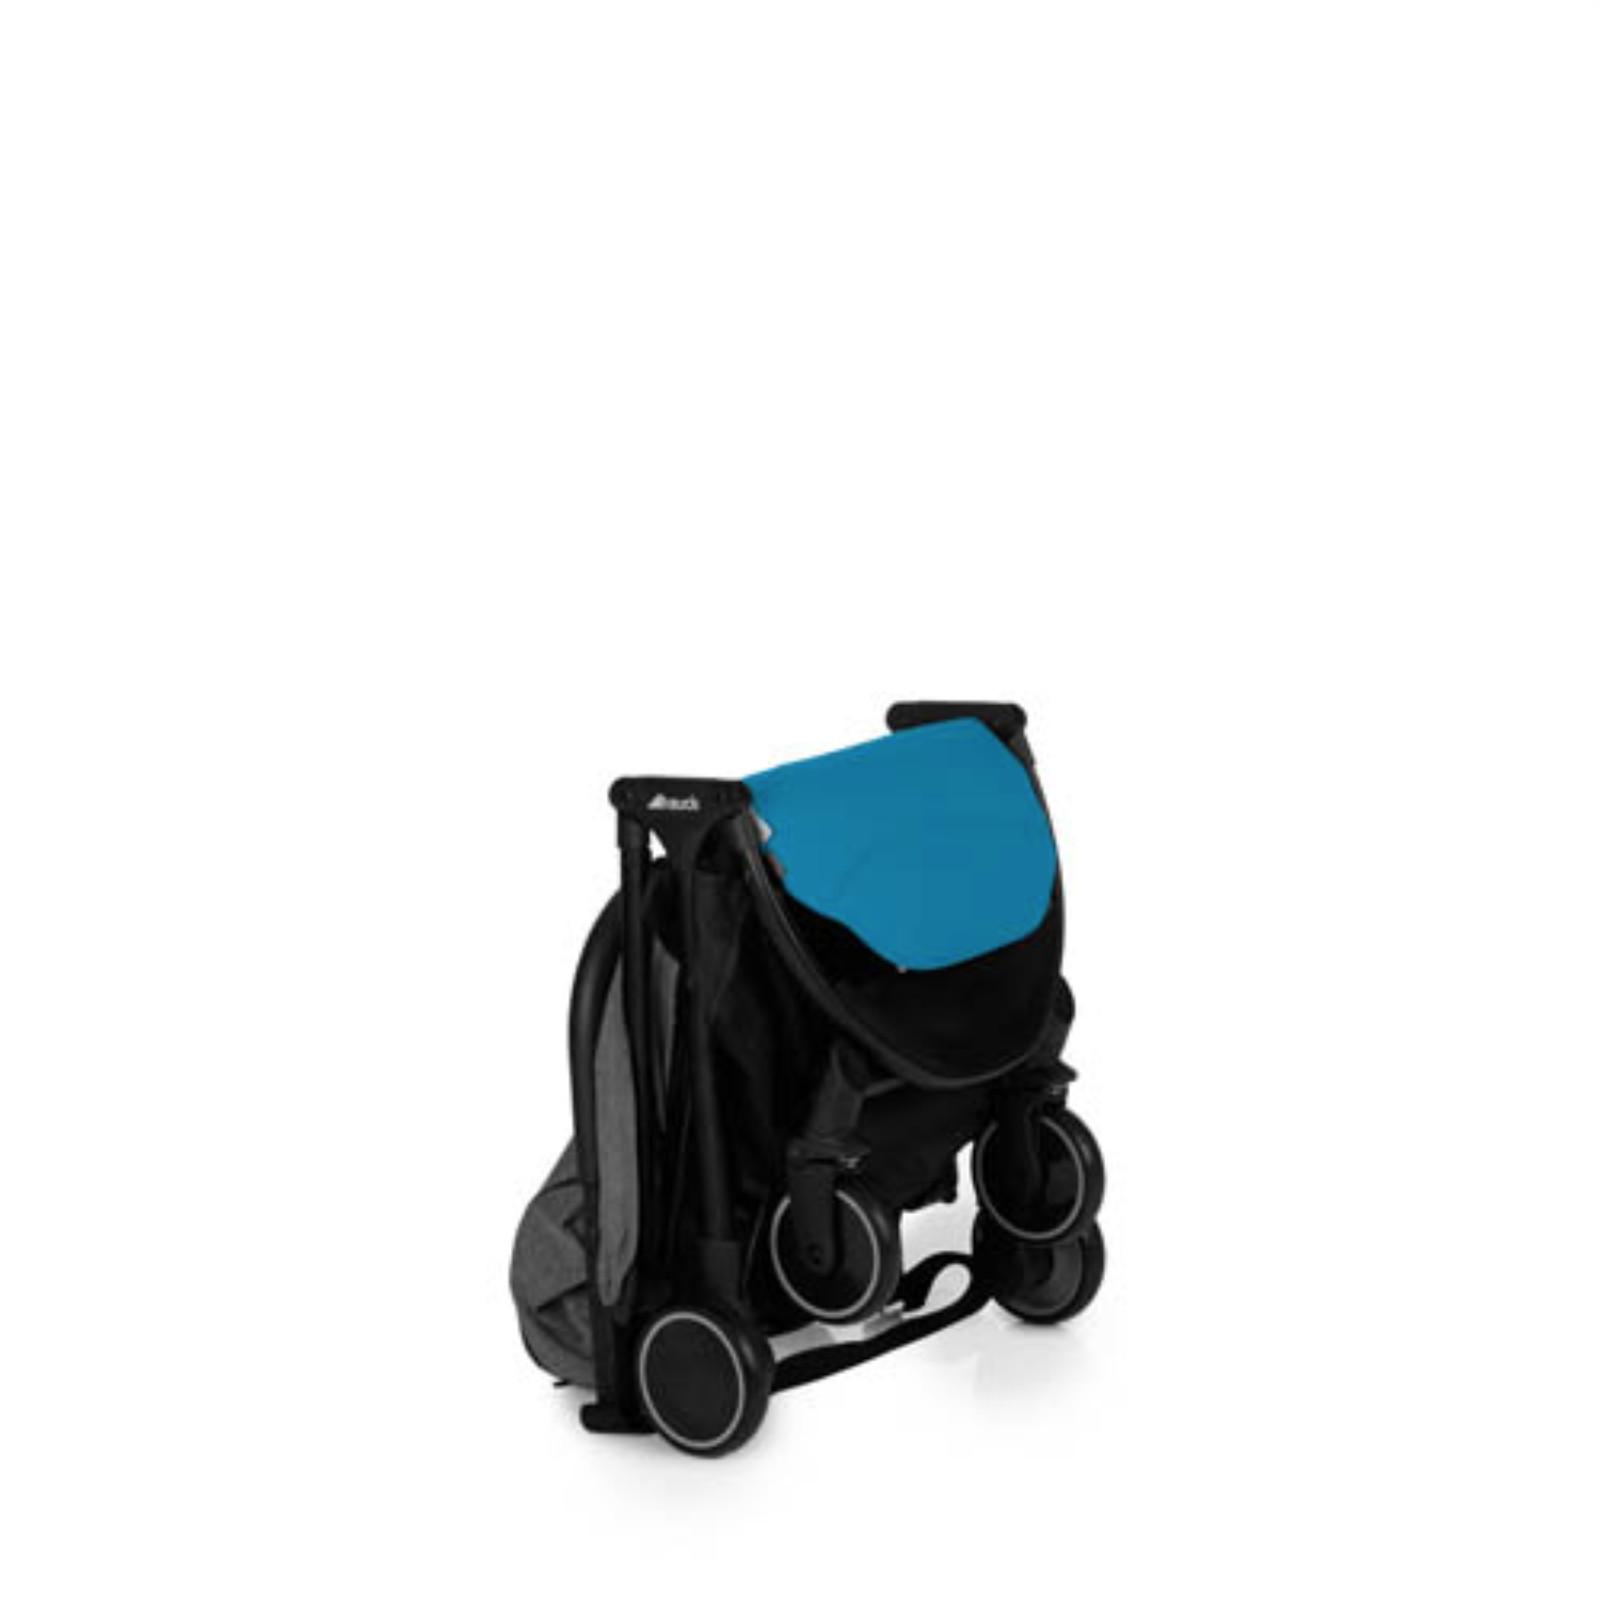 Nursing Bags On Wheels >> HAUCK MELANGE GREY / AZURE SWIFT PUSHCHAIR STROLLER BABY ...